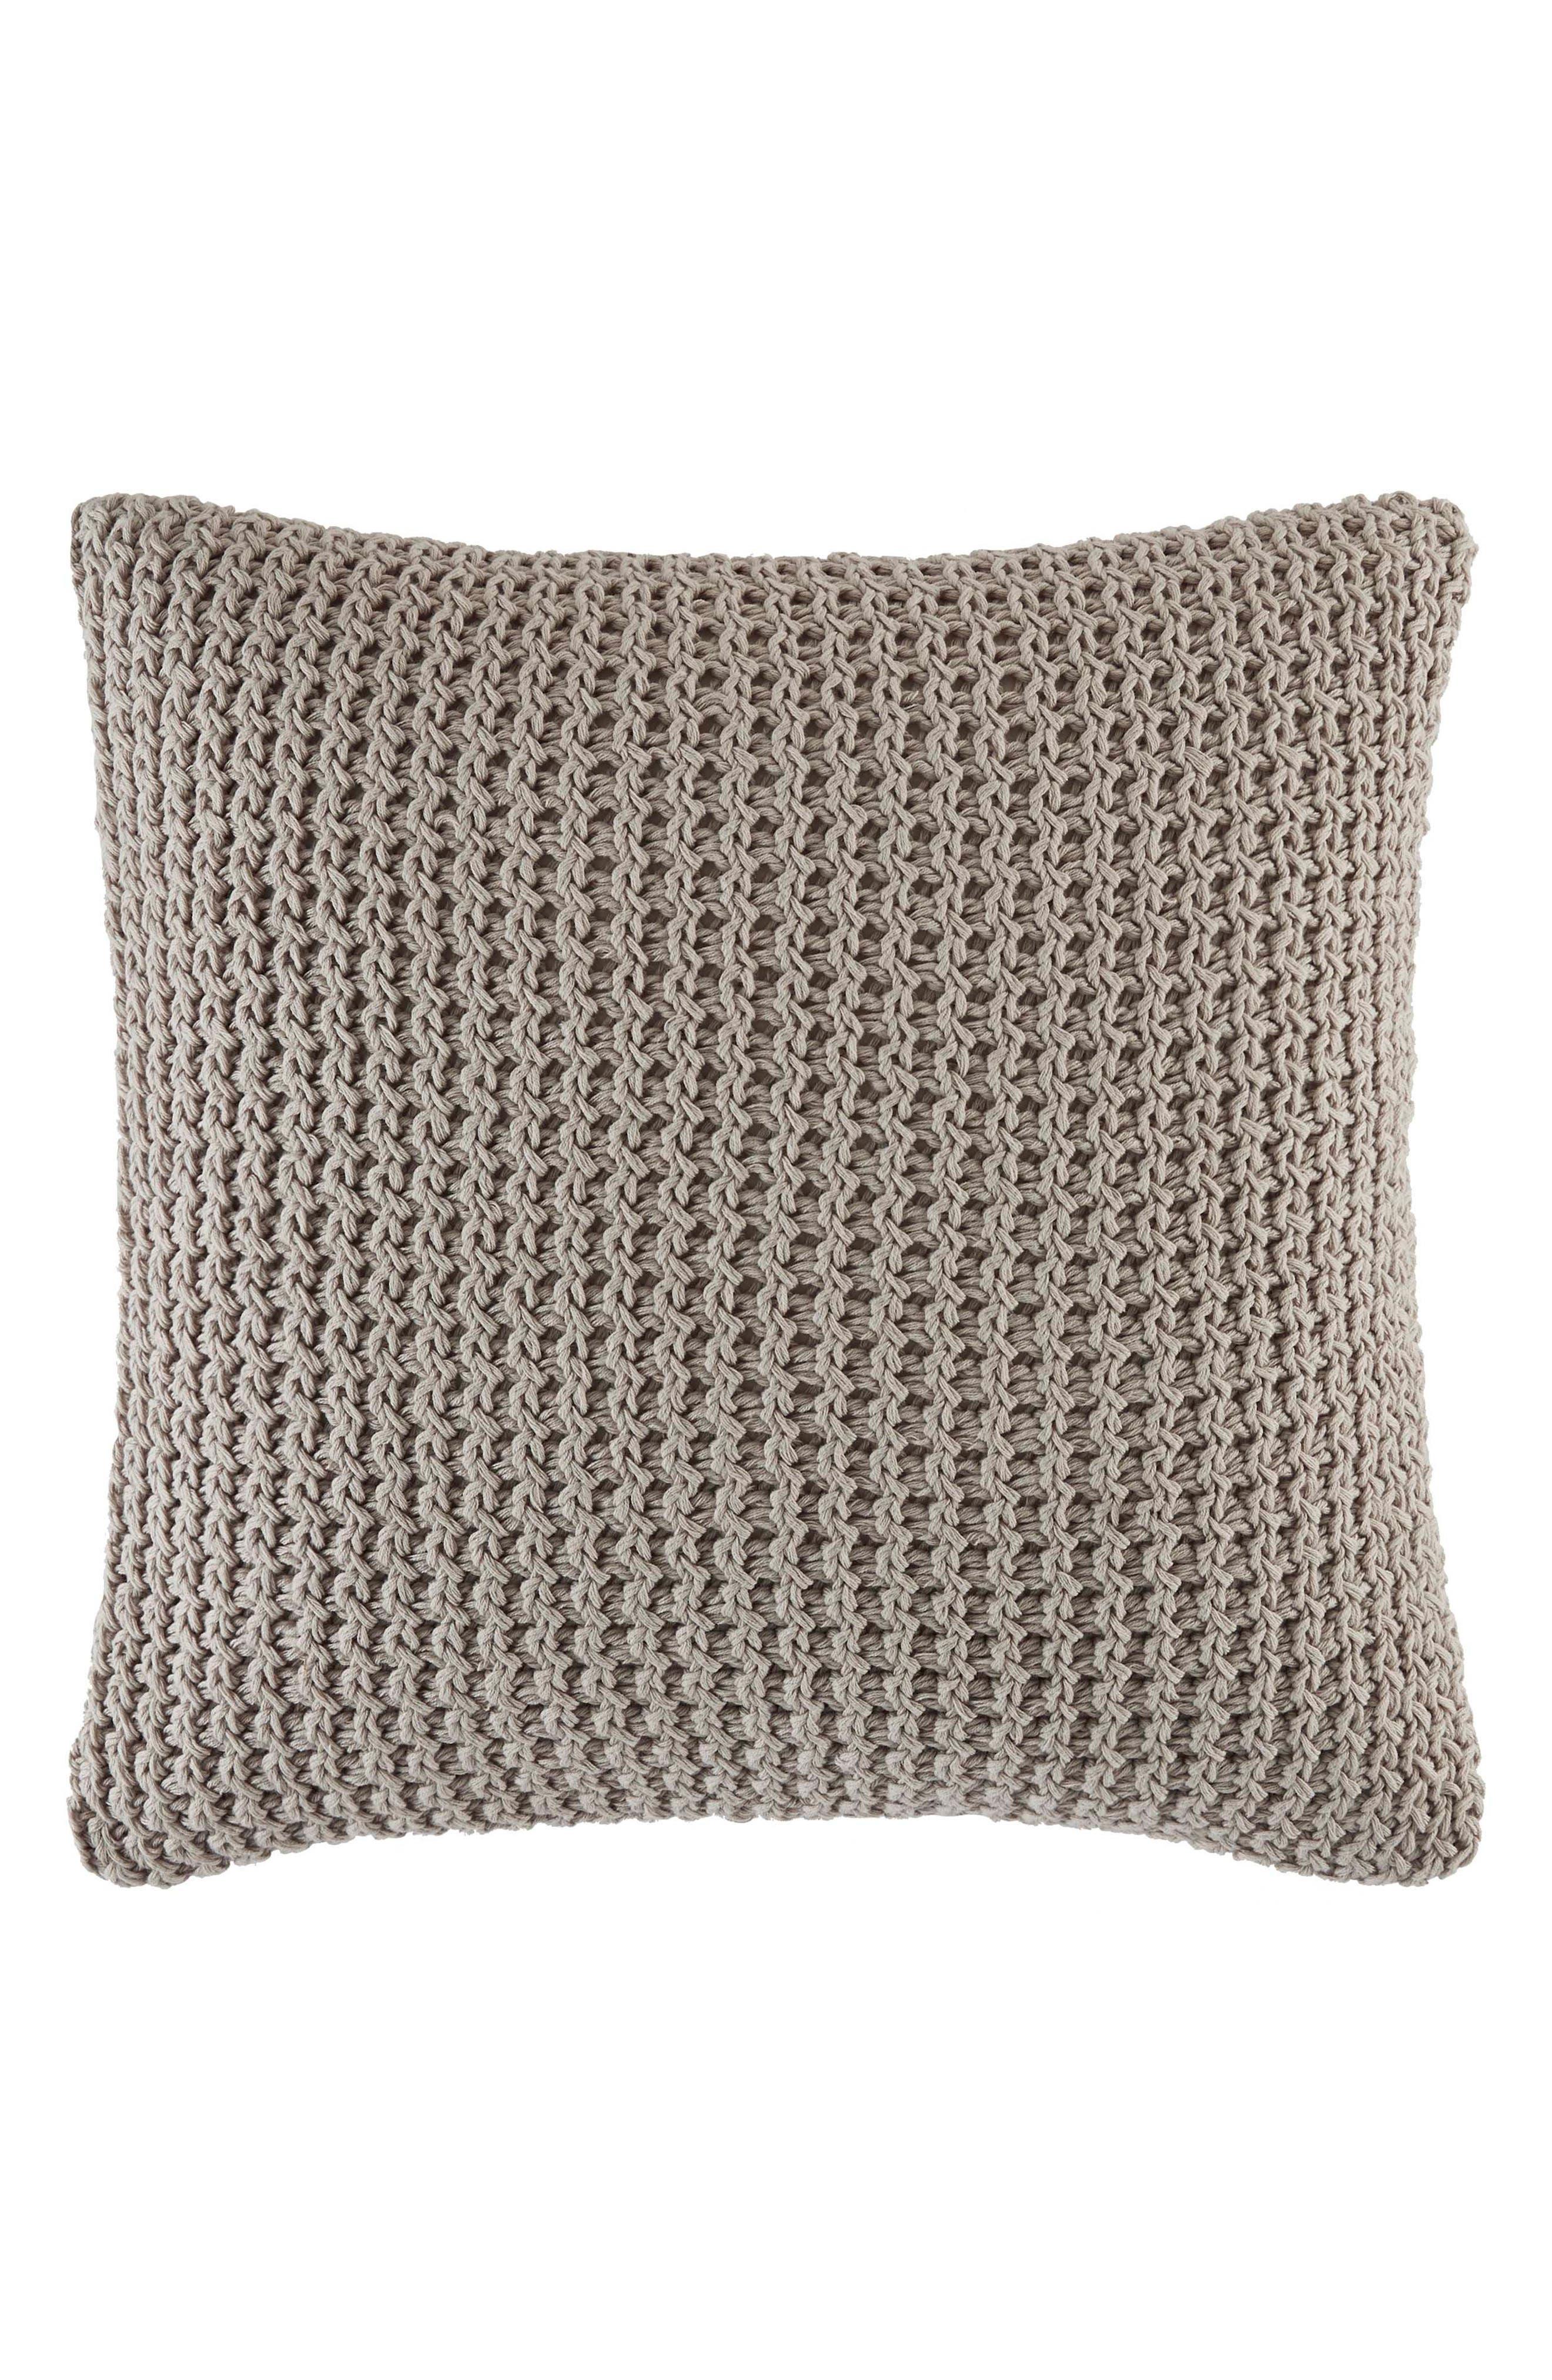 Main Image - ED Ellen DeGeneres Knotted Pillow